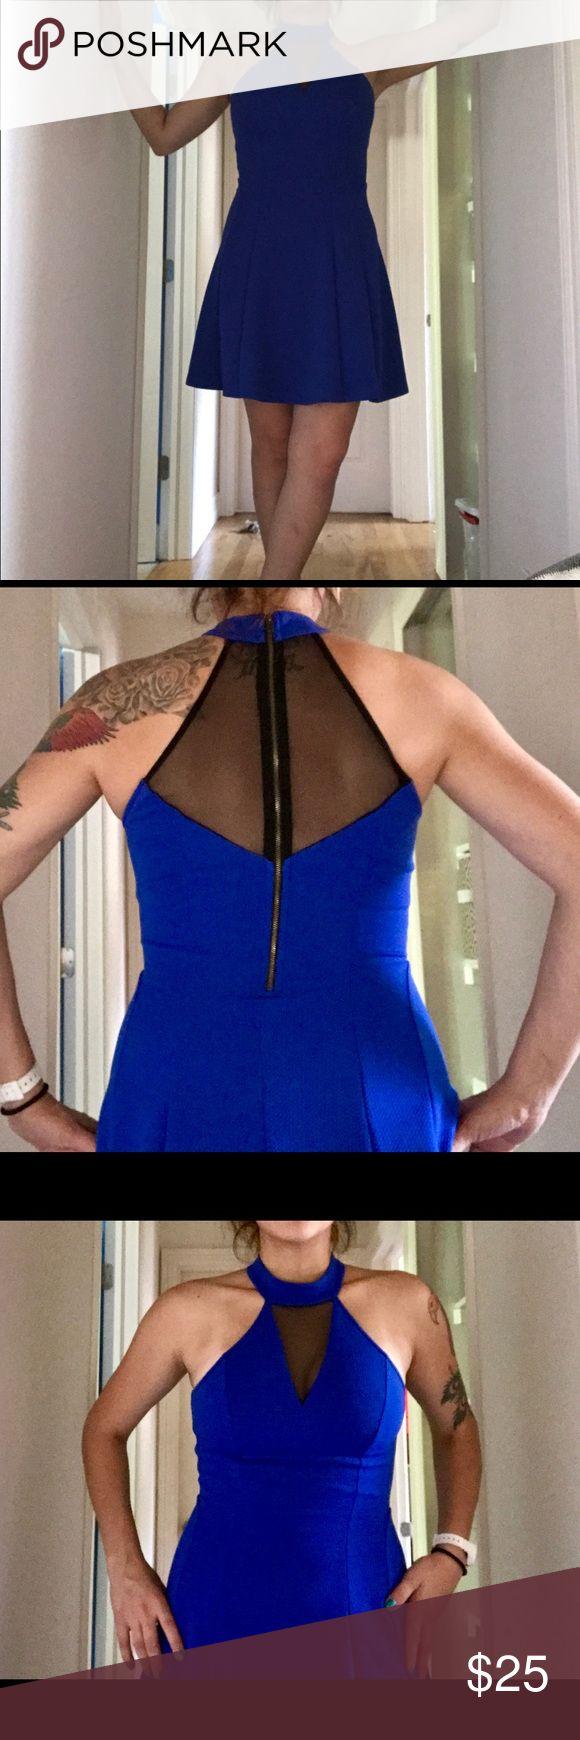 Pantyhose for a royal blue dress